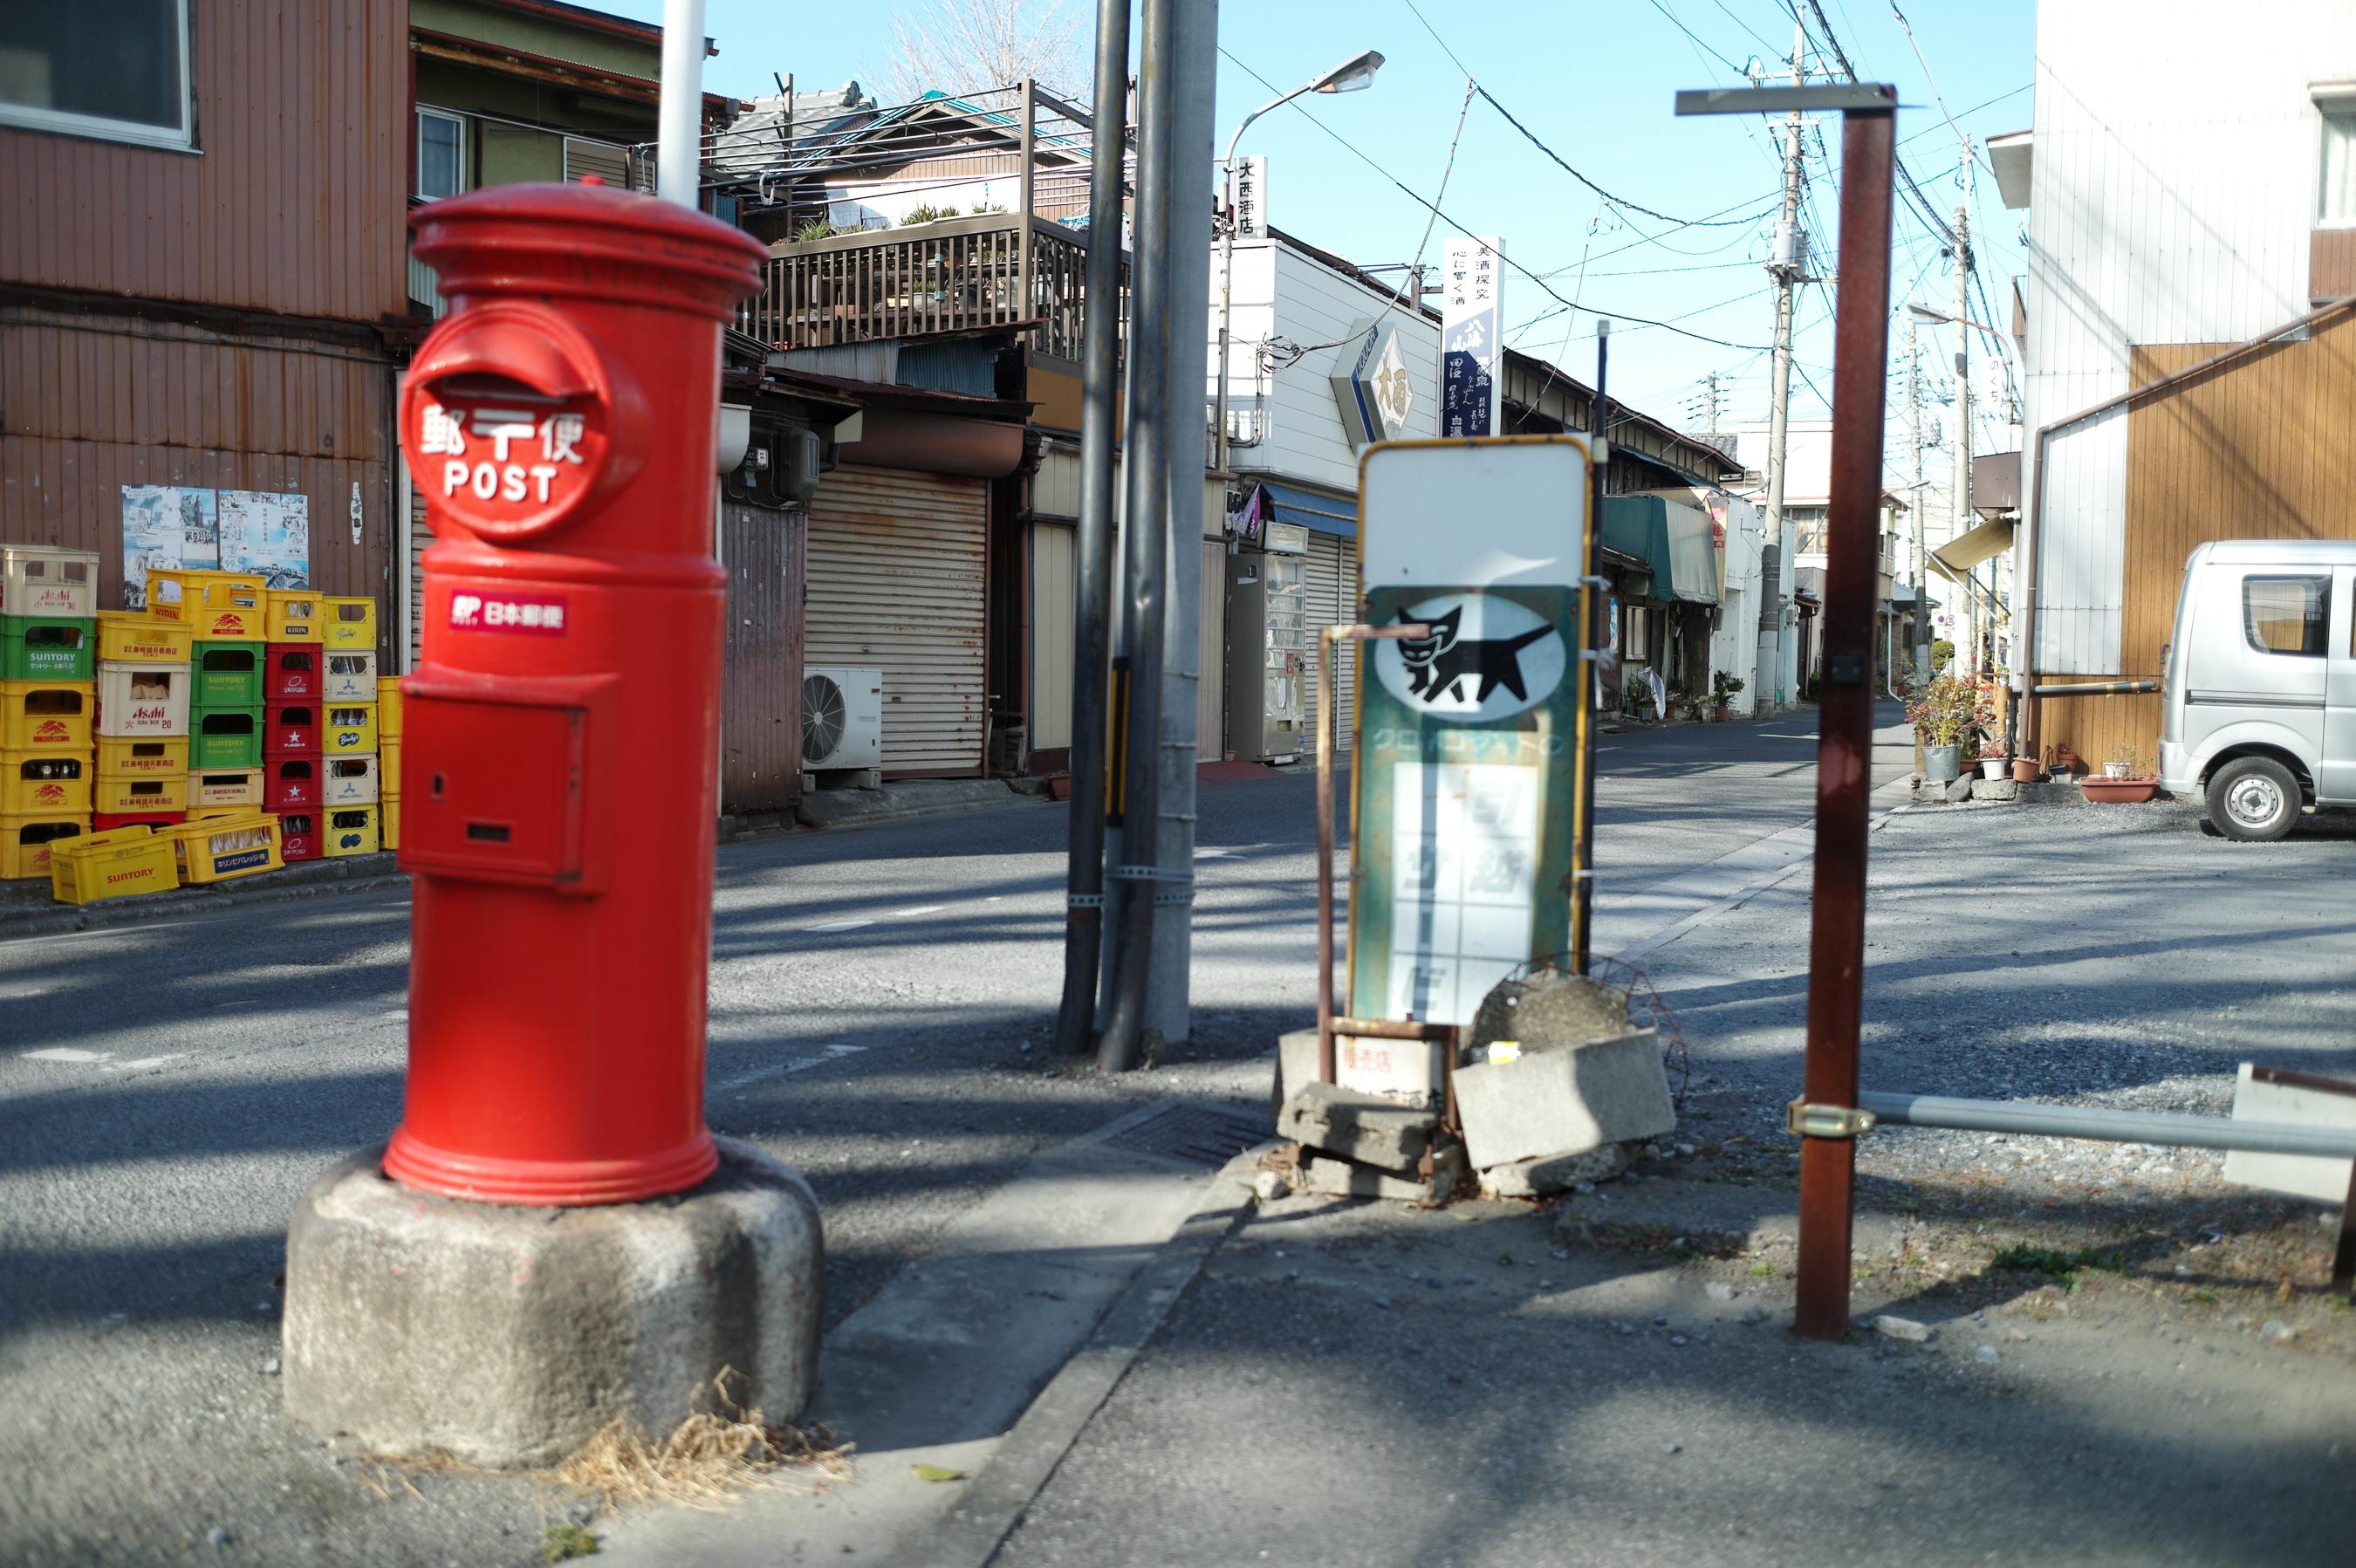 f:id:aoyama-takuro:20180211221652j:plain